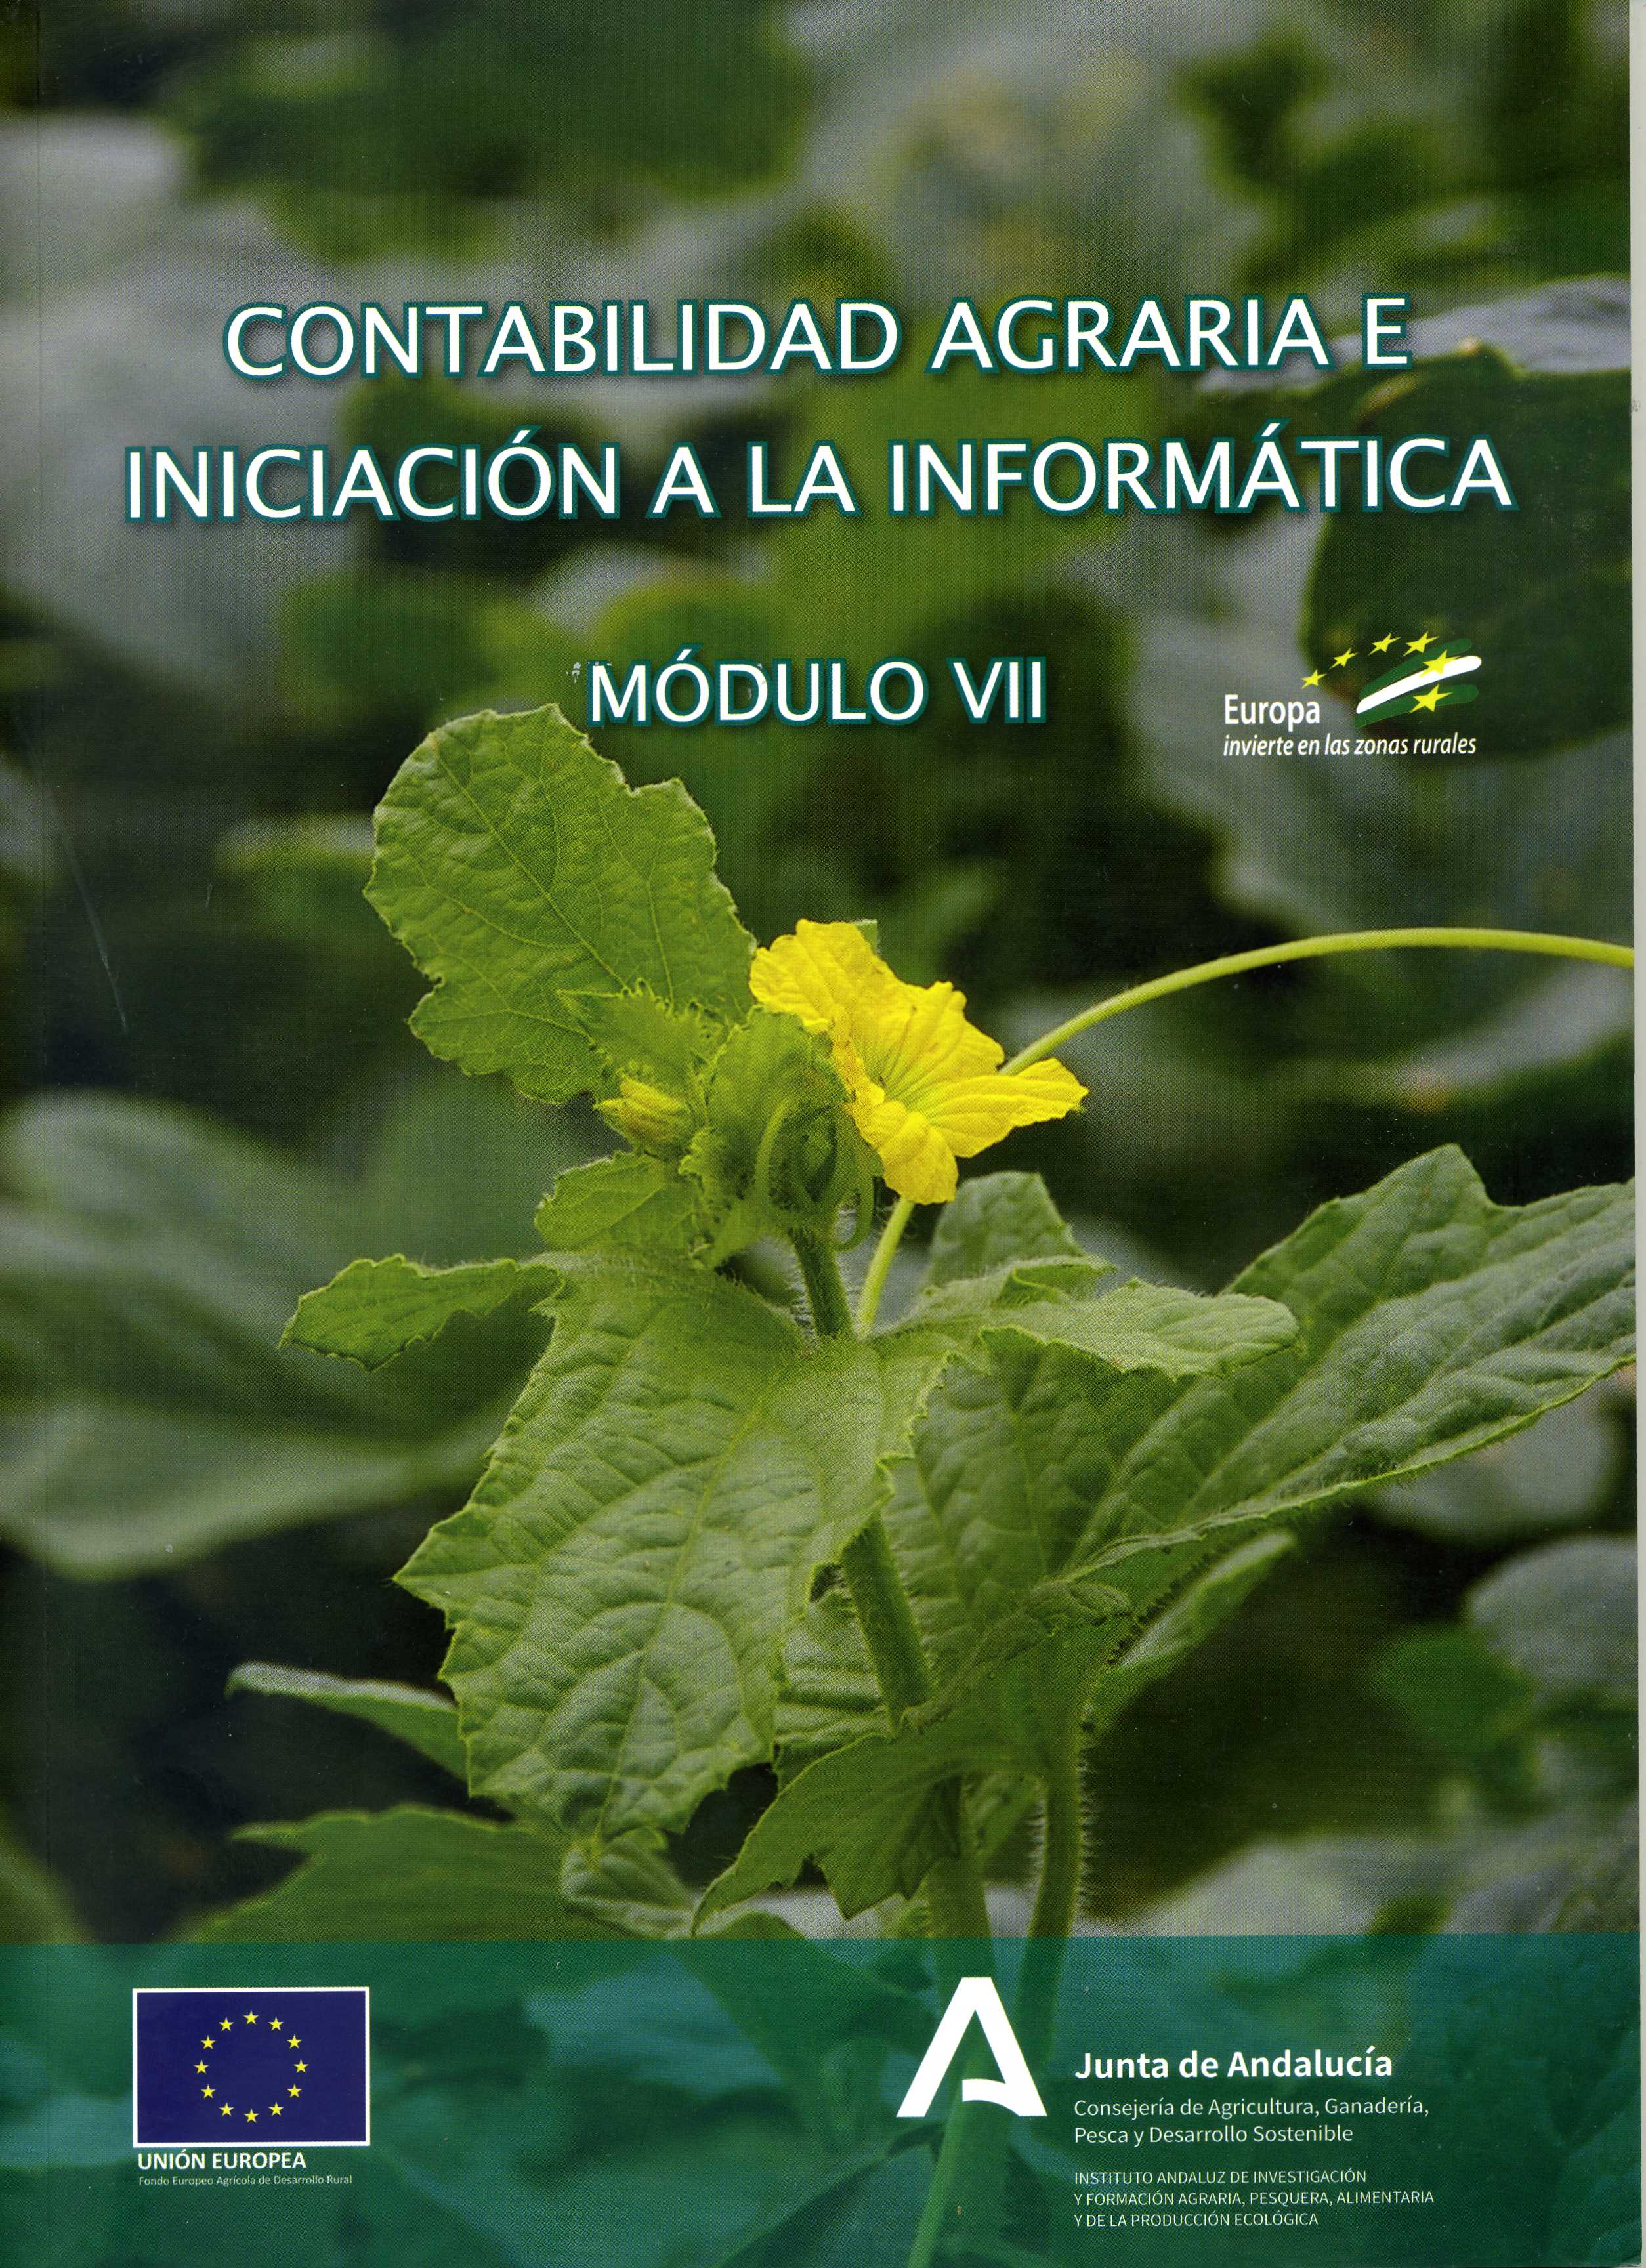 CONTABILIDAD AGRARIA E INICIACION A LA INFORMÁTICA. MÓDULO VII